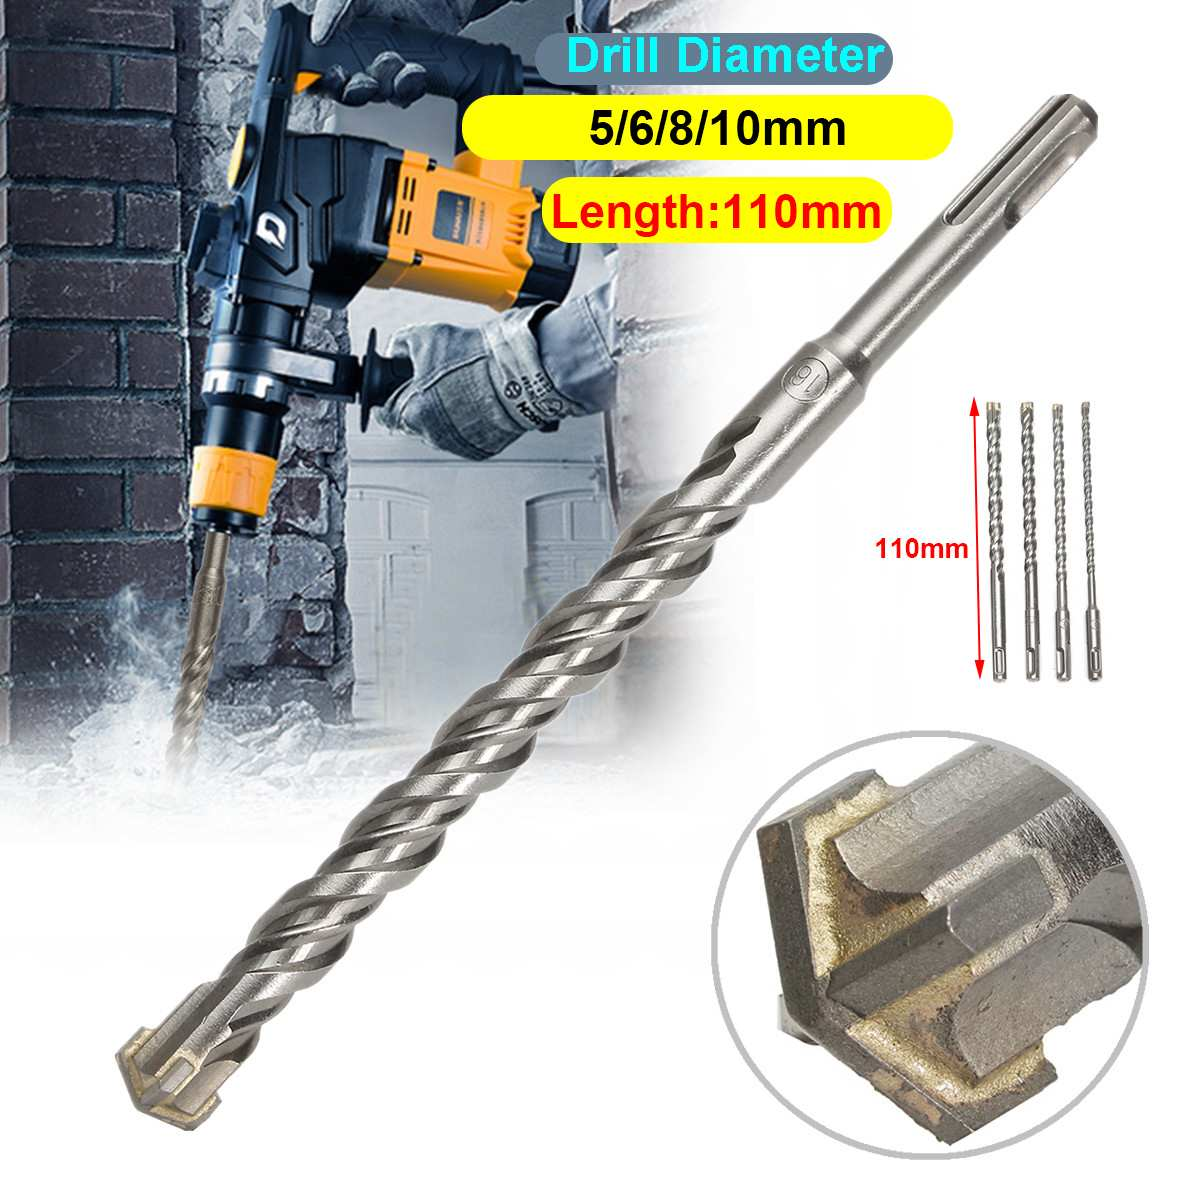 3pcs 600mm SDS Drill Bit Set Masonry Brick Block Concrete Deep Reach 12,16,24mm